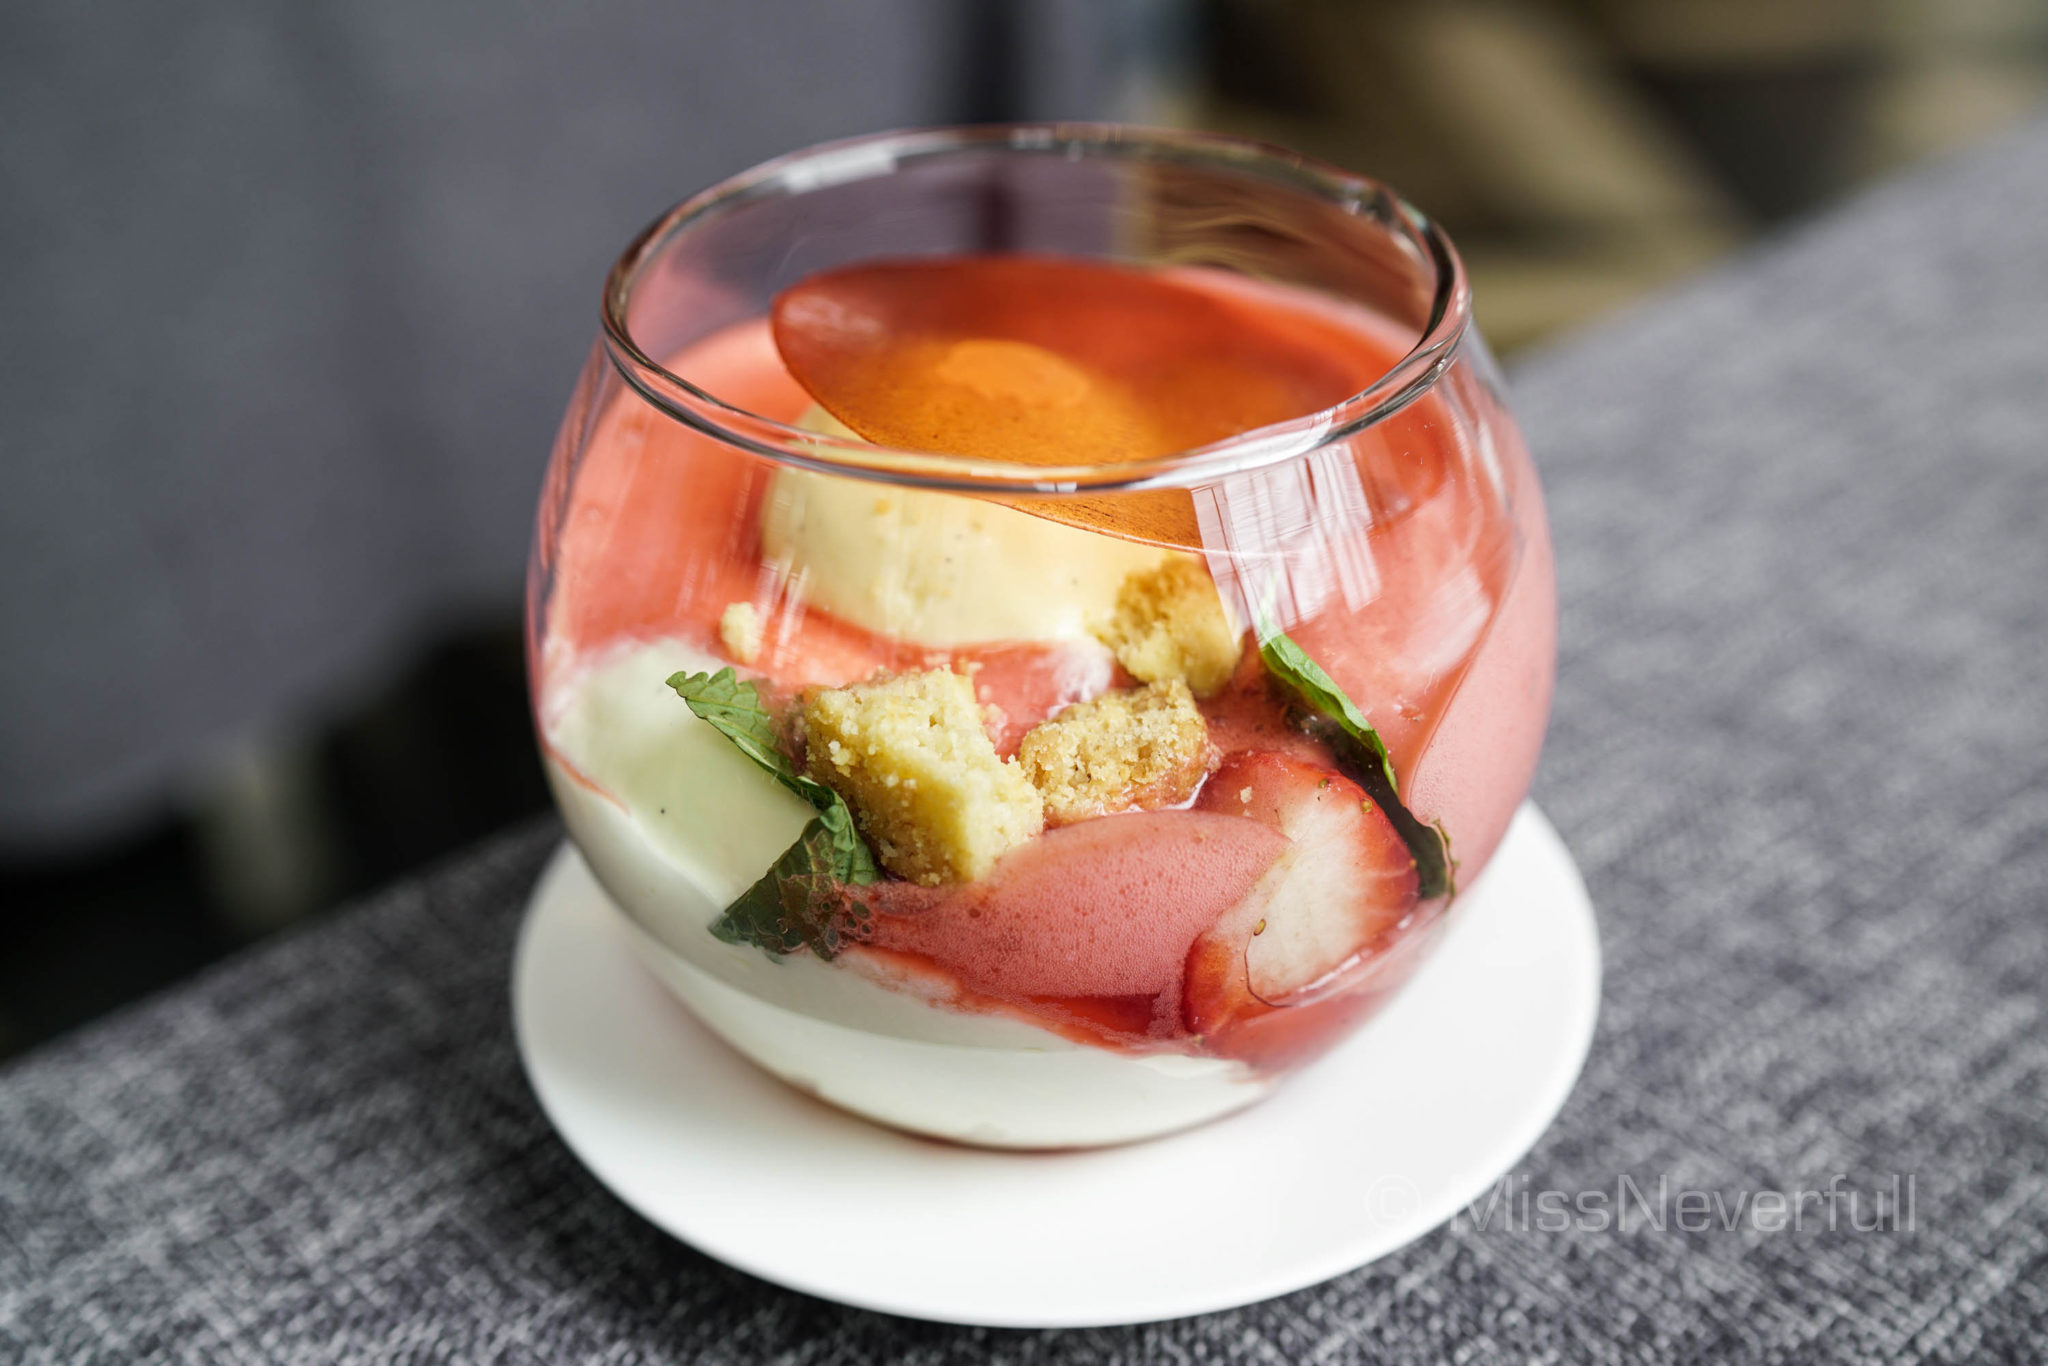 Strawberry & vanilla triffle 千层草莓雪糕(RMB 80) [seasonal]